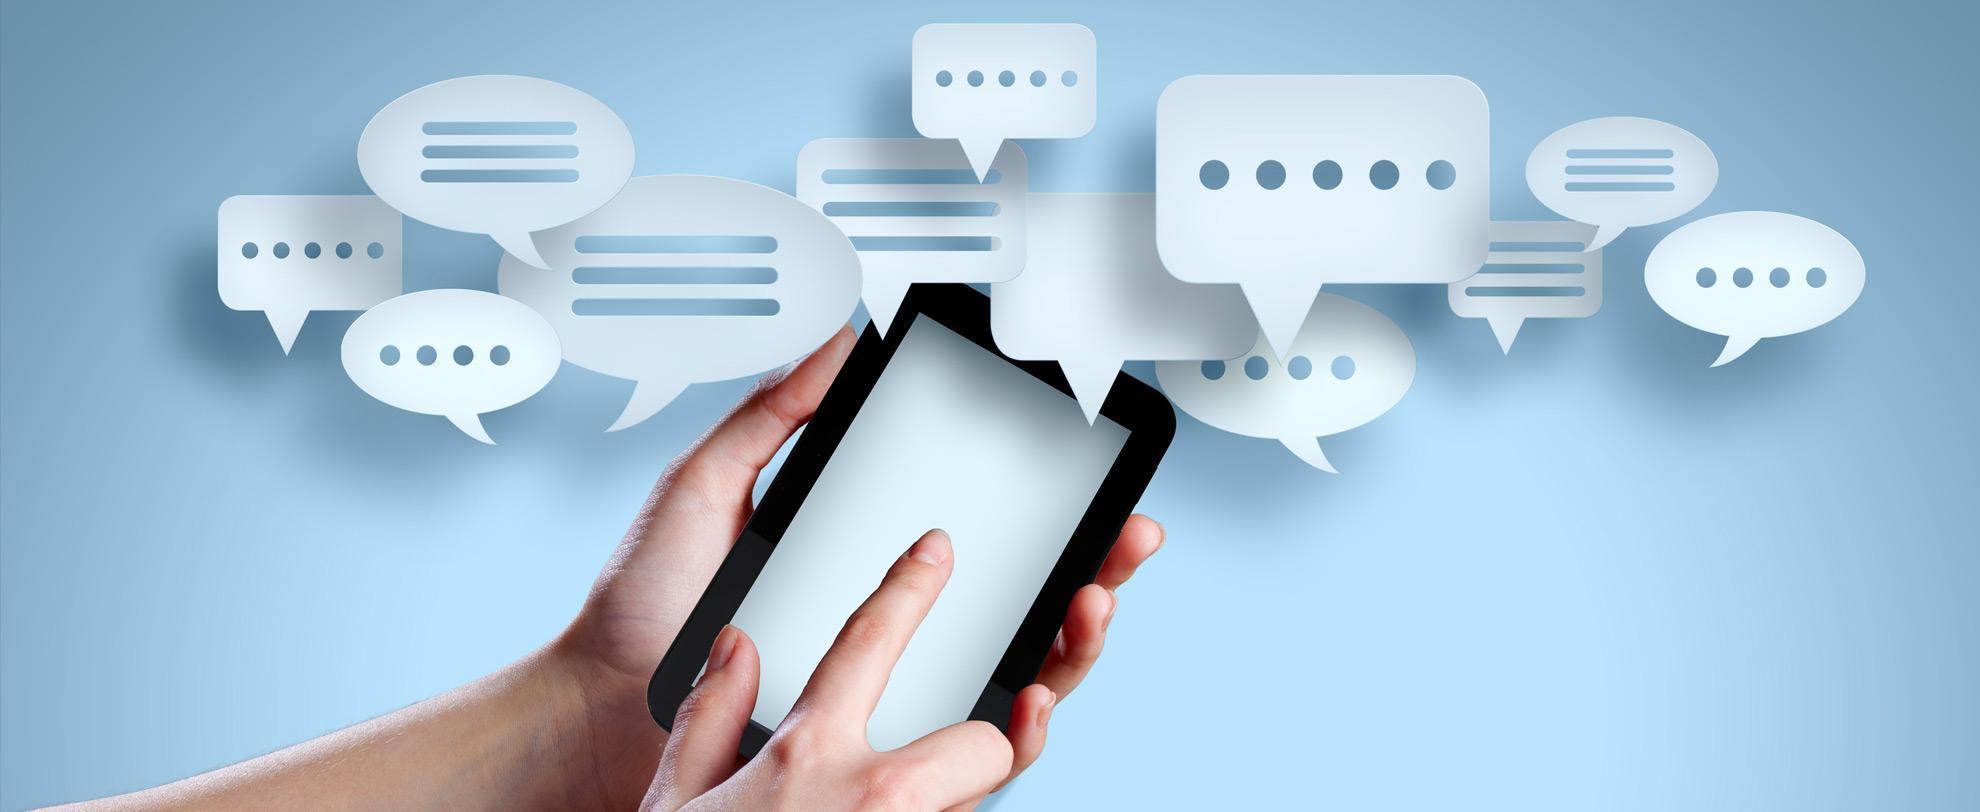 mobile texting.jpg